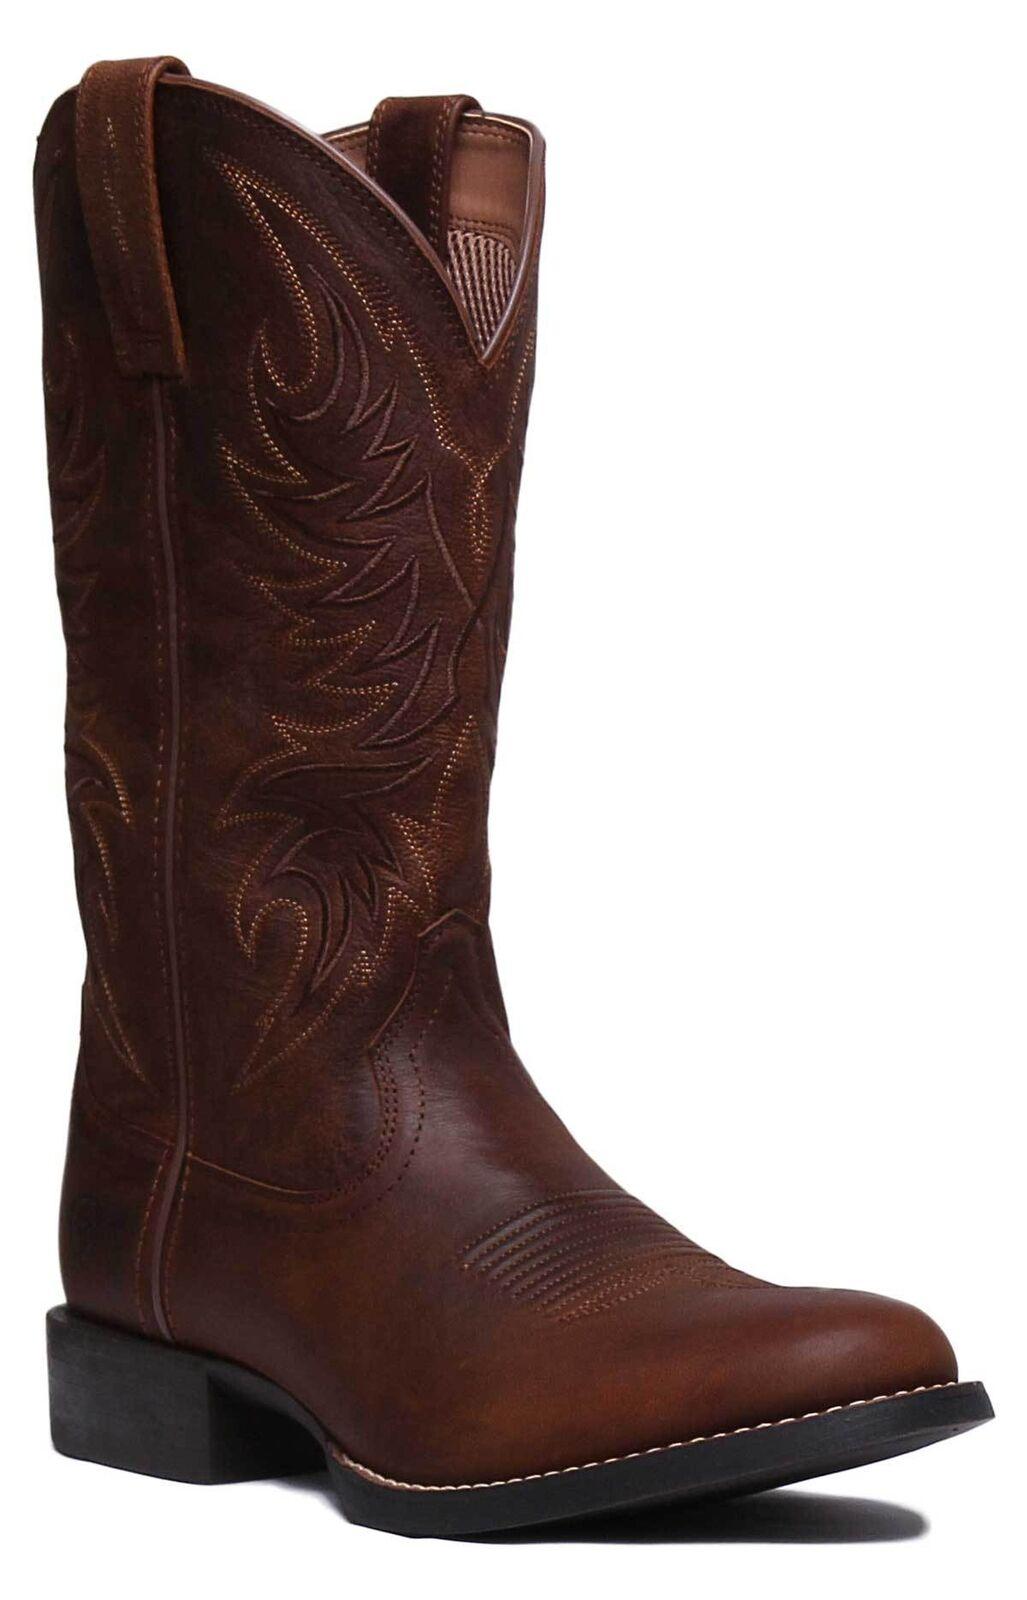 Ariat Sport Horseman Men Leather Tan Western Knee High Boots UK Size 6 - 12